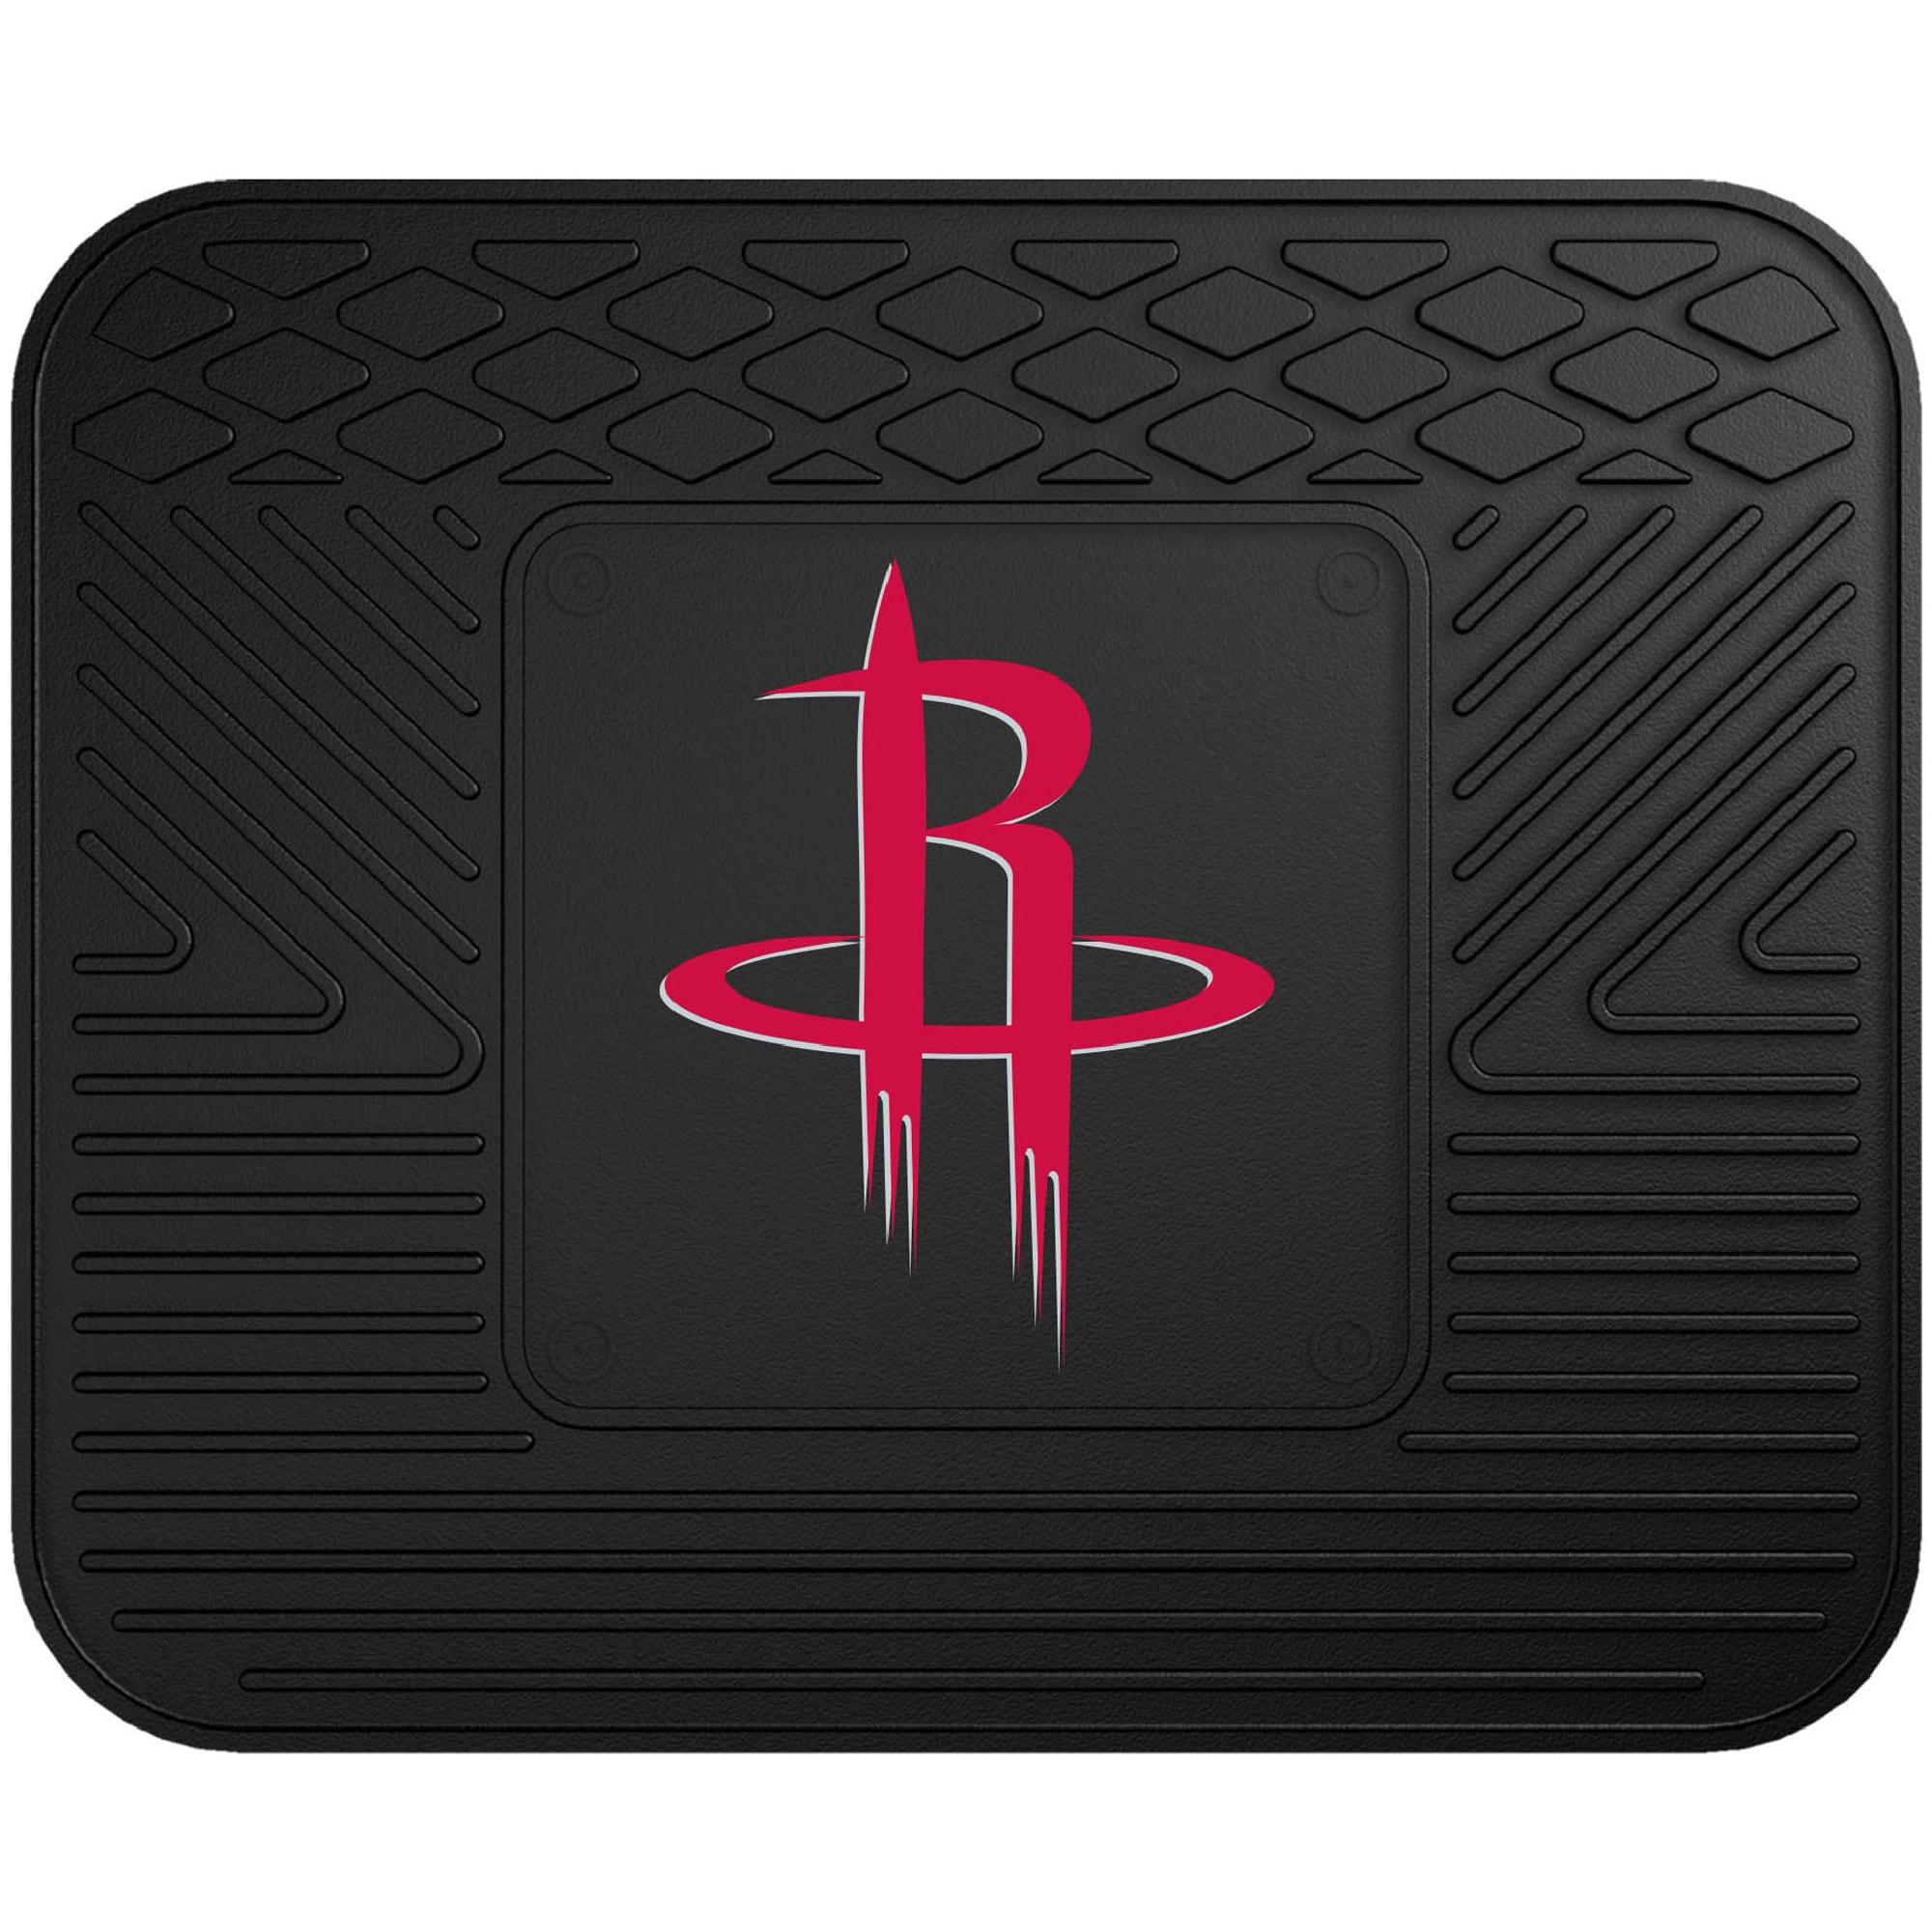 "Houston Rockets 17"" x 14"" Utility Mat"